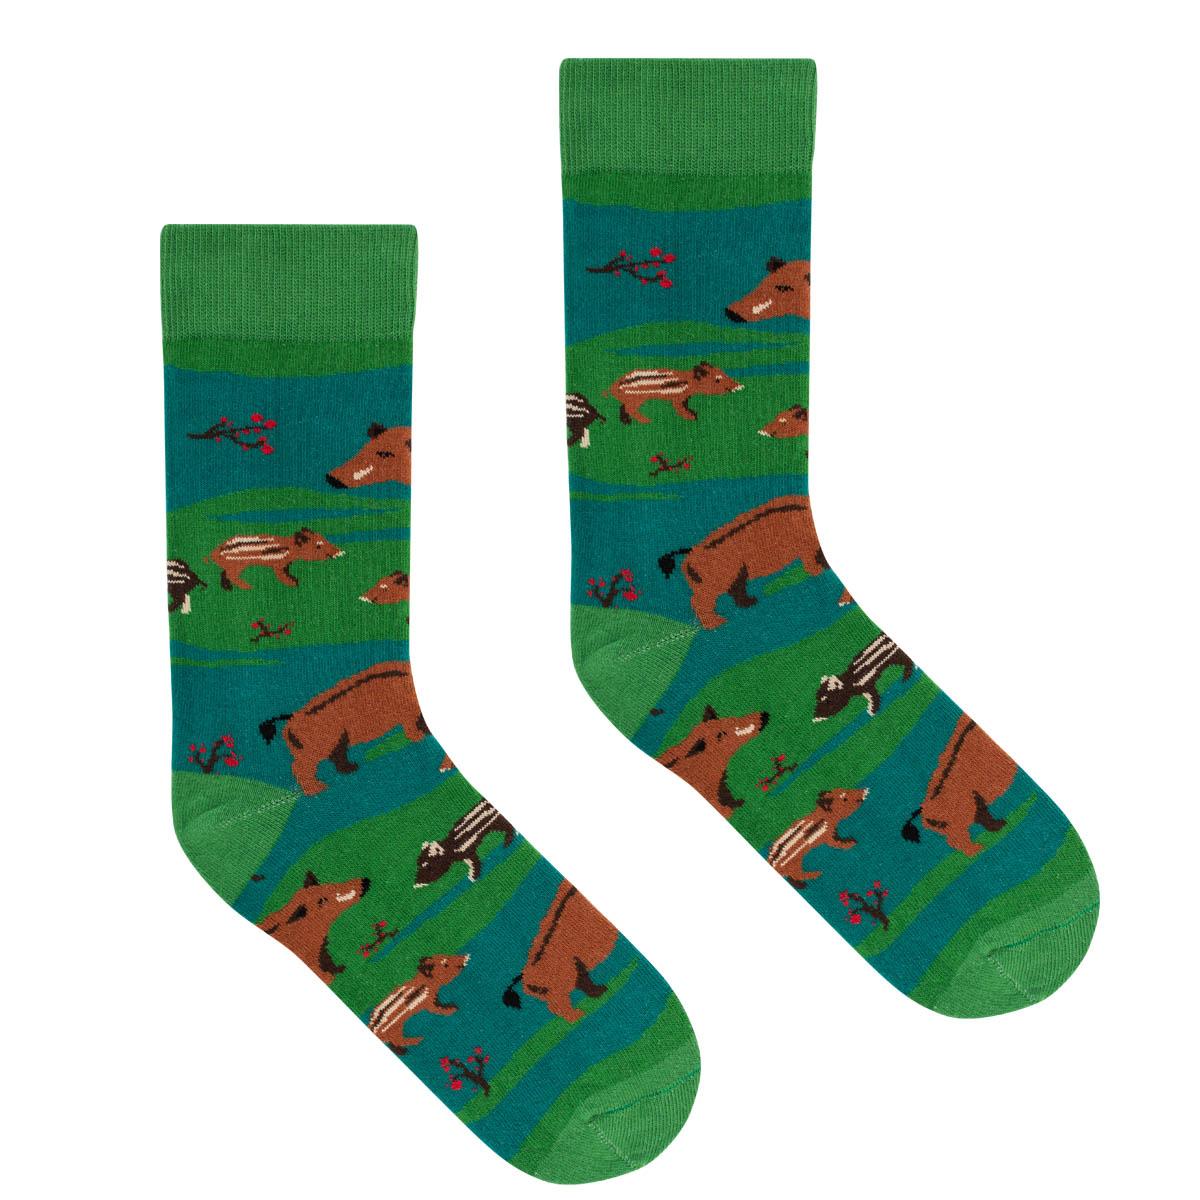 socks_patterned_boar_36-41_kabak_5903678204075